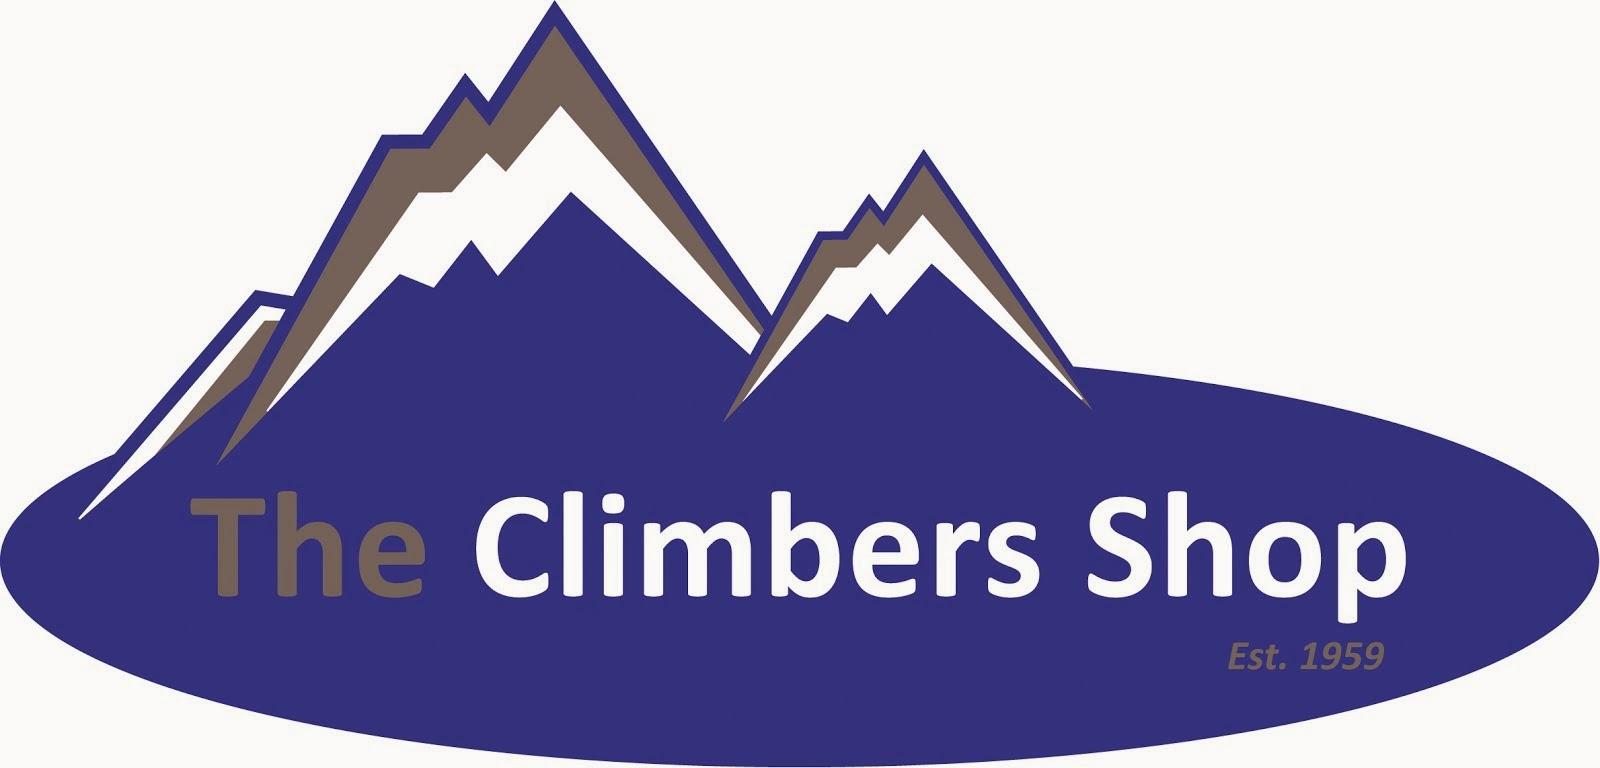 The Climbers' Shop